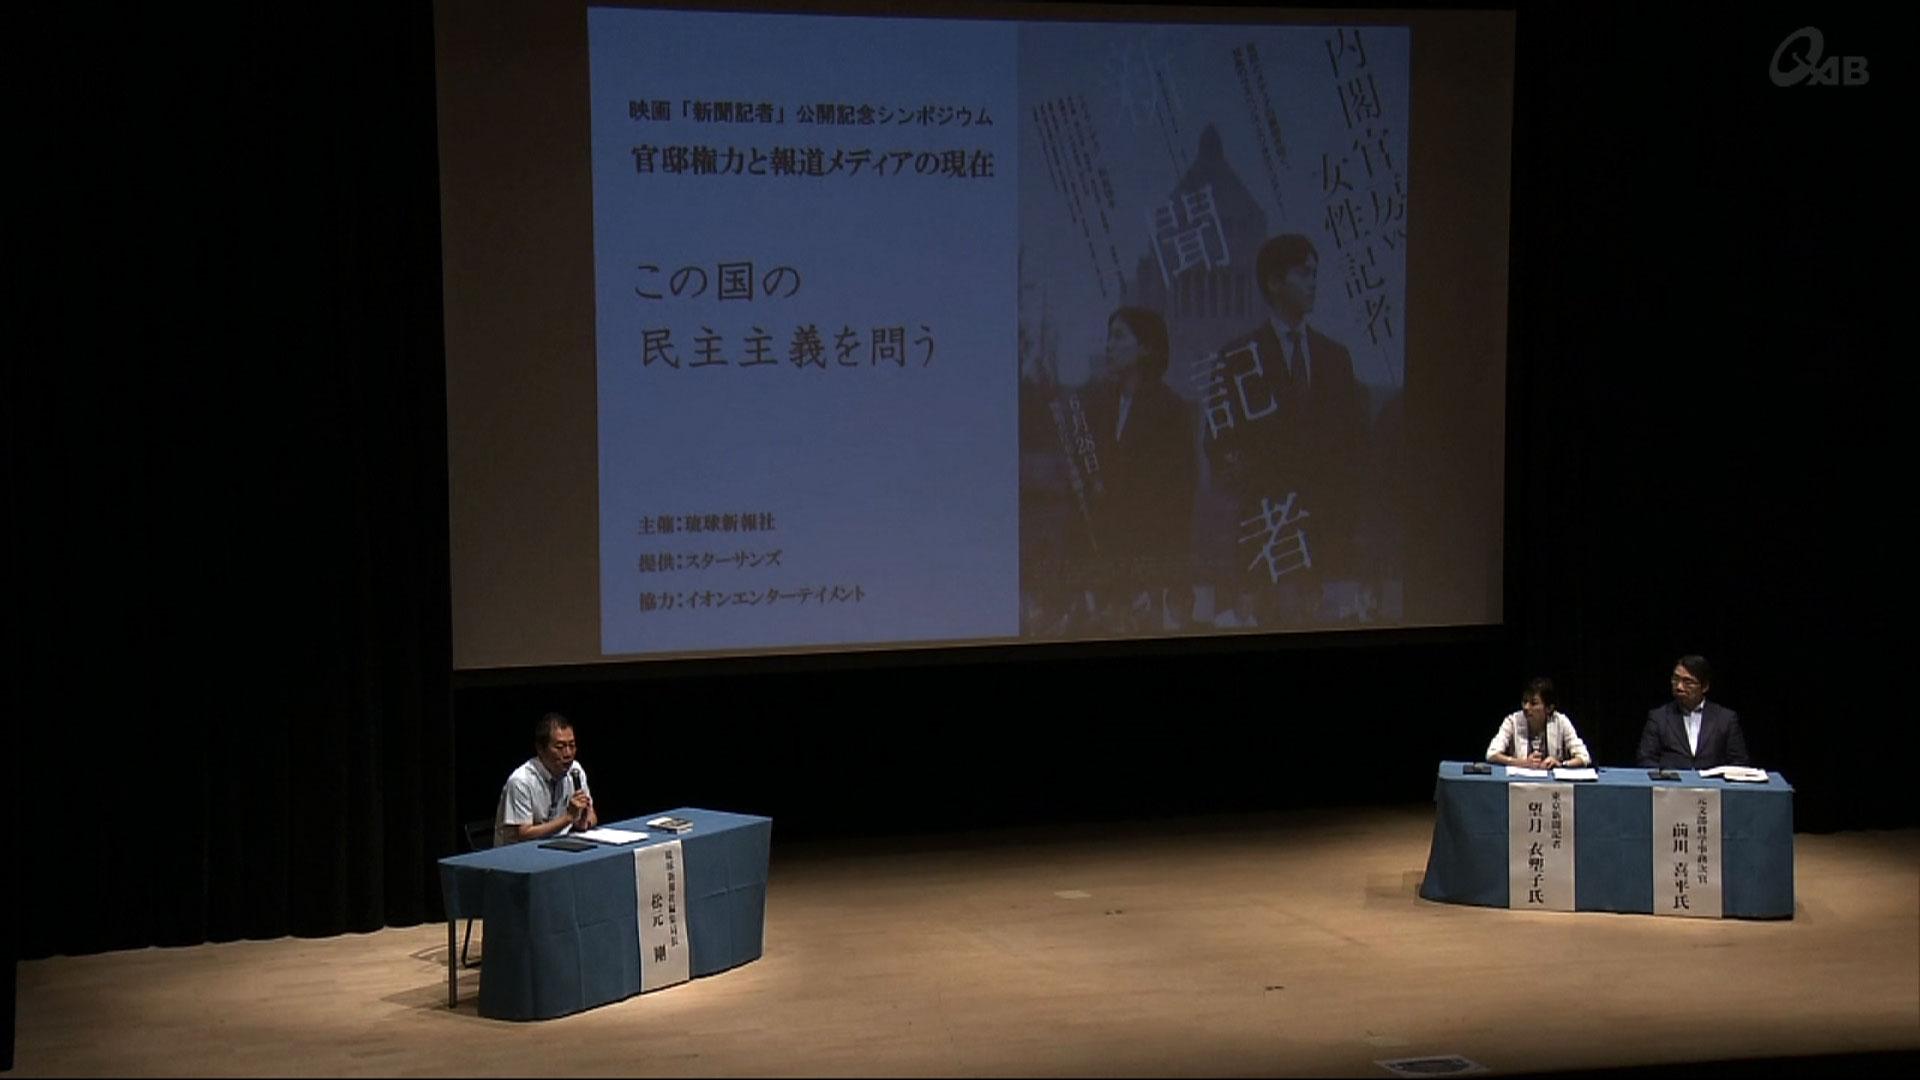 映画「新聞記者」公開記念シンポ 望月記者が登壇